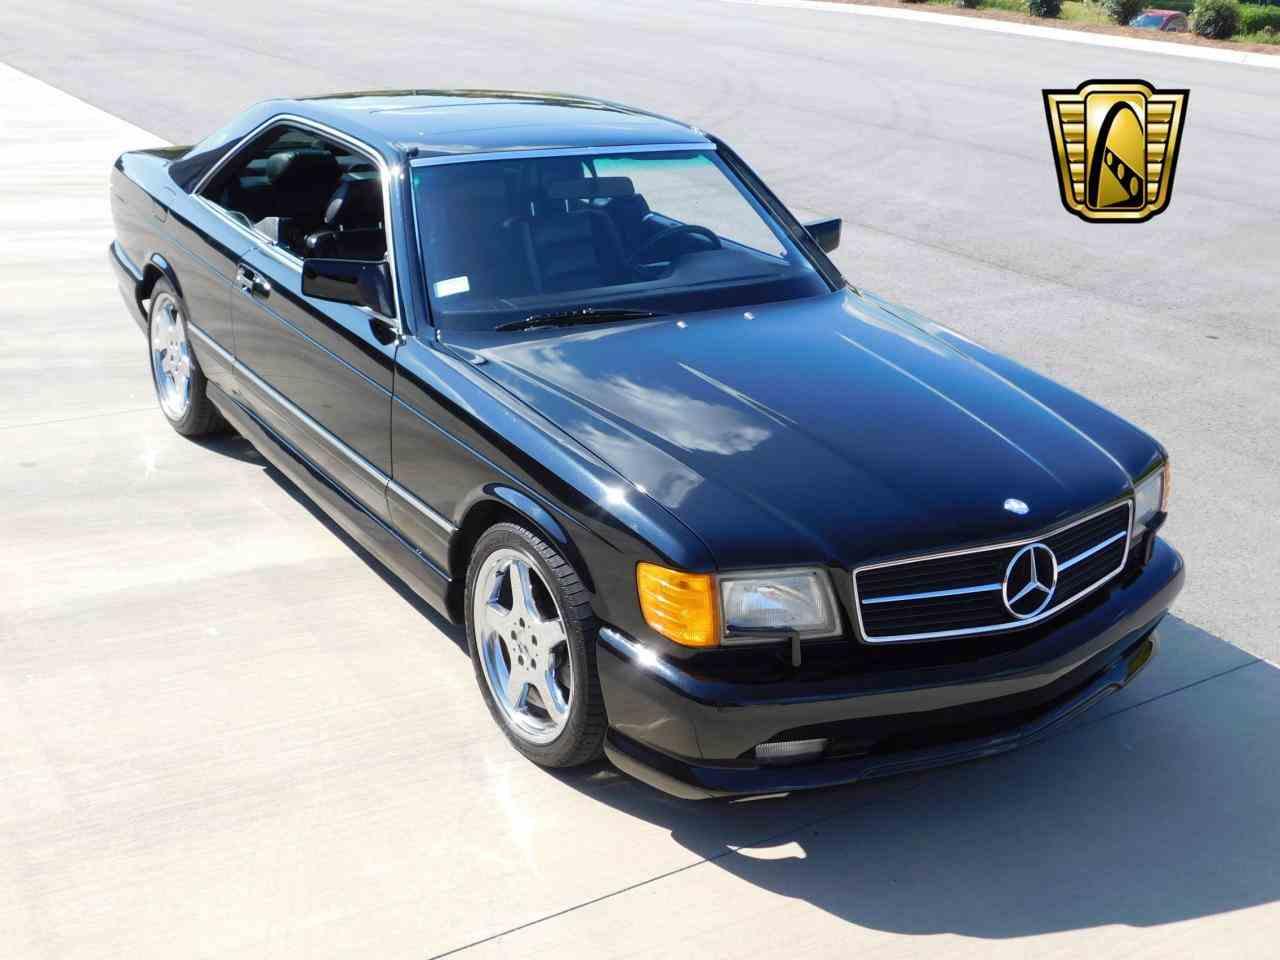 1991 mercedes benz 560sec for sale cc for Mercedes benz alpharetta ga